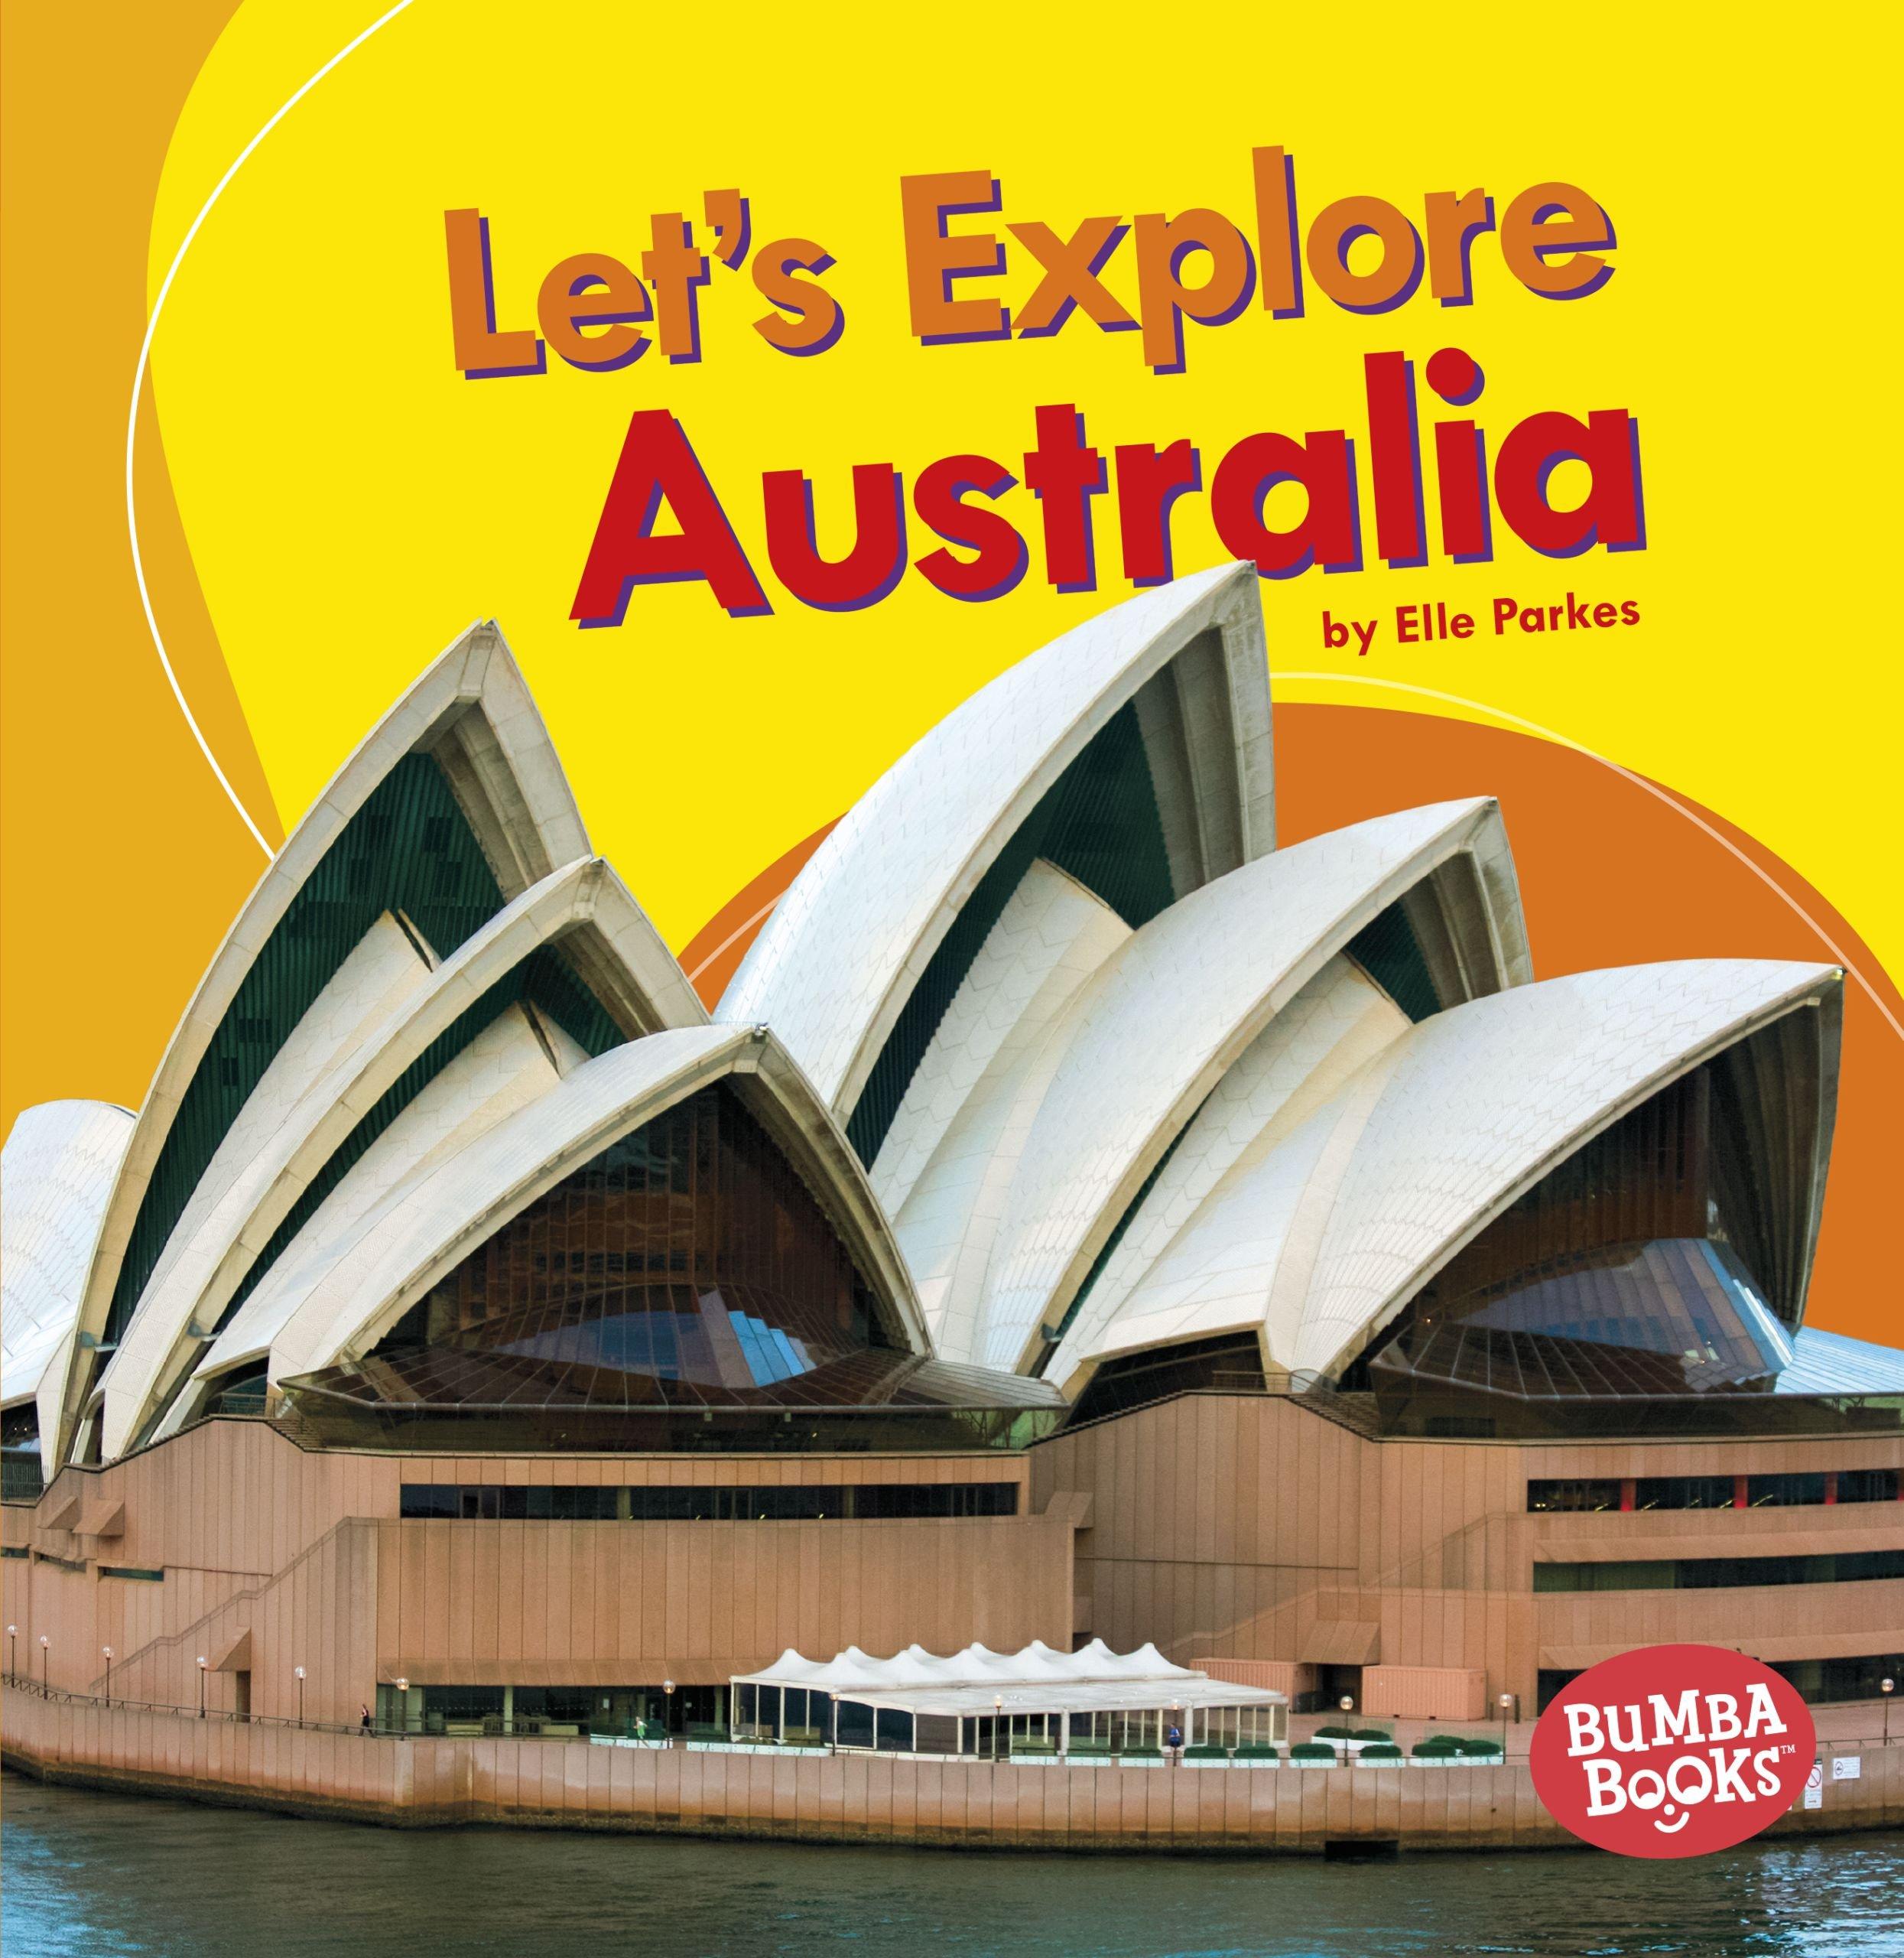 Let's Explore Australia (Bumba Books Let's Explore Countries)